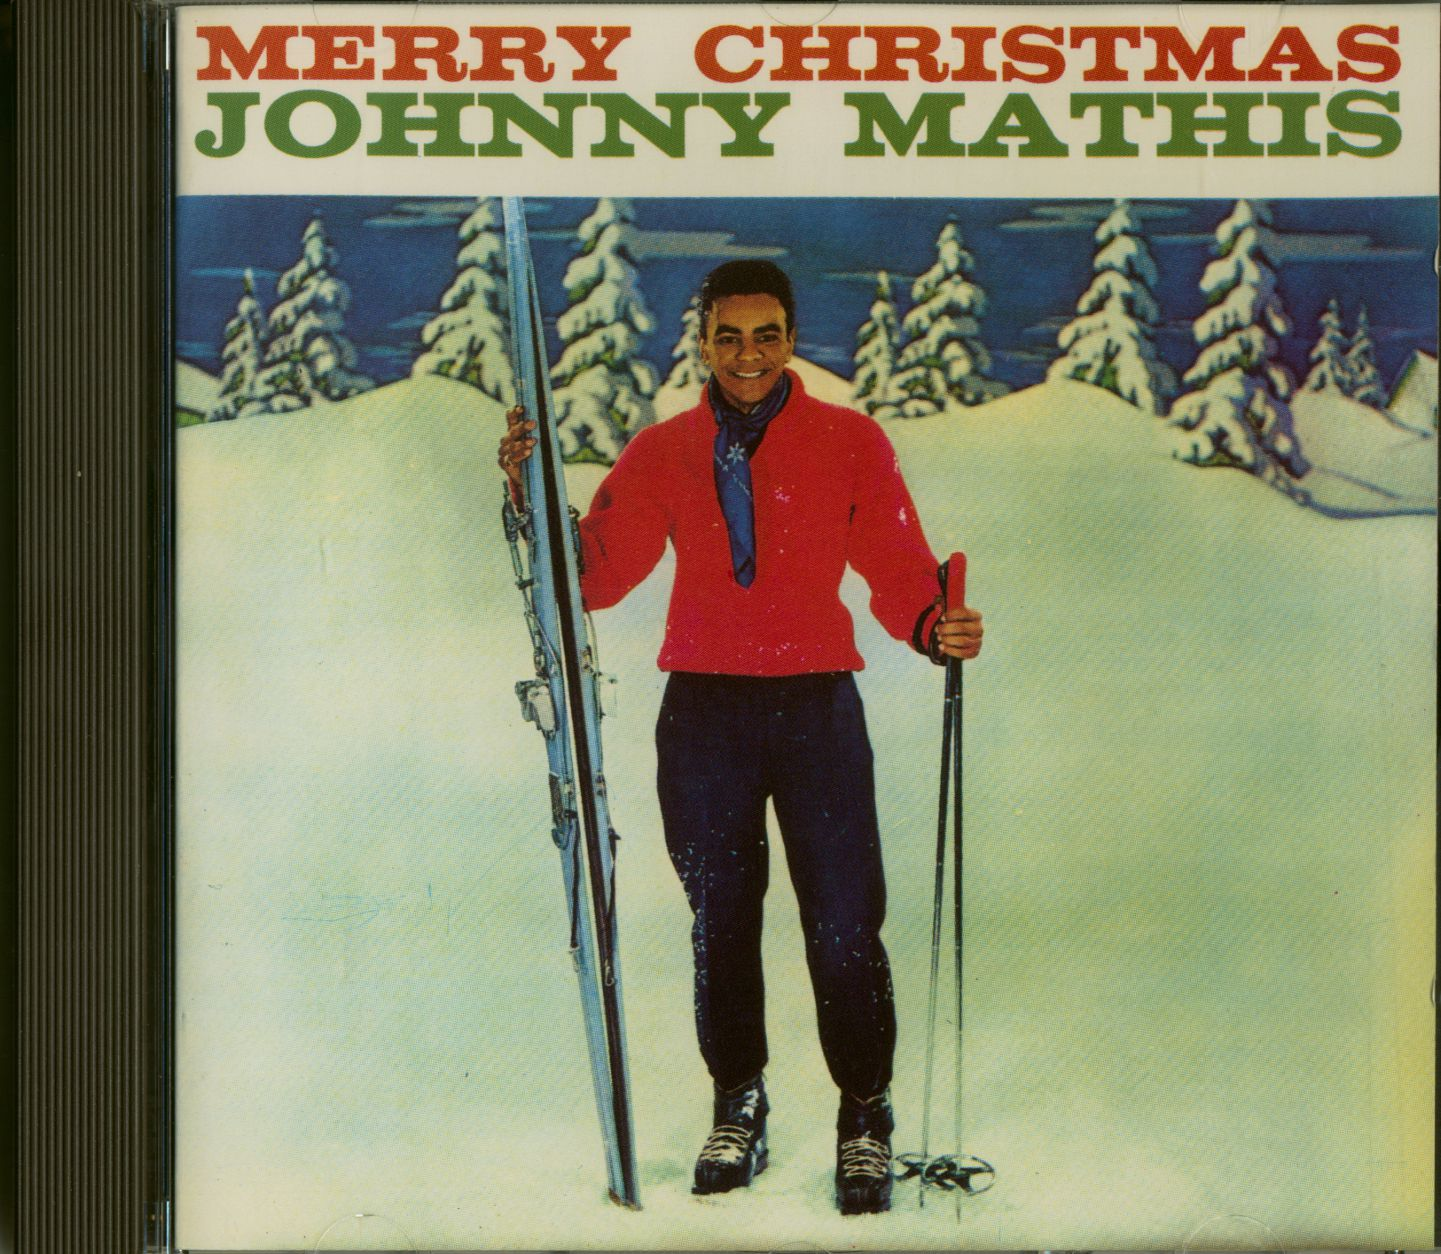 Johnny Mathis - Merry Christmas - Pop Christmas 5099705703922   eBay